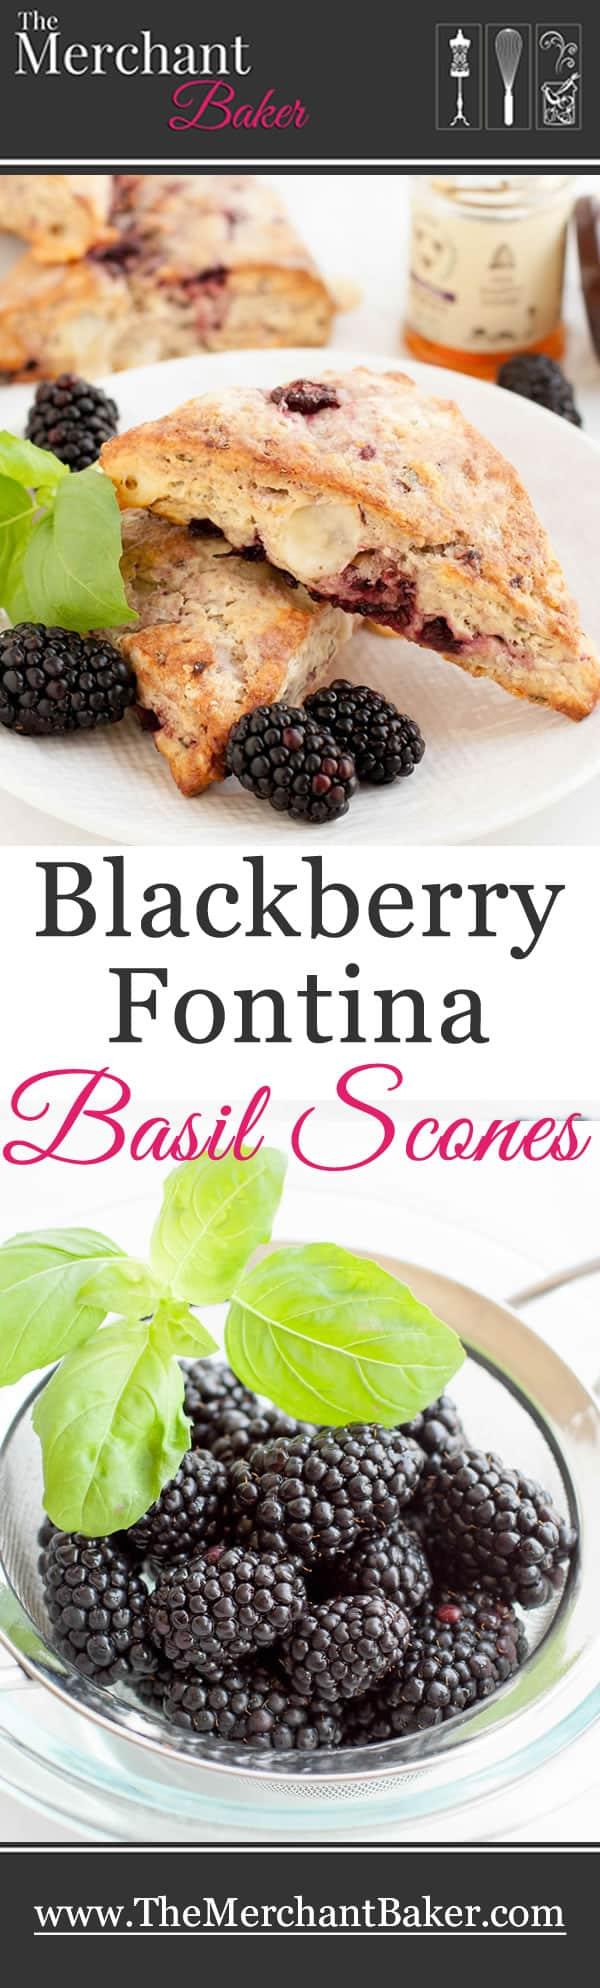 Blackberry Fontina Basil Scones